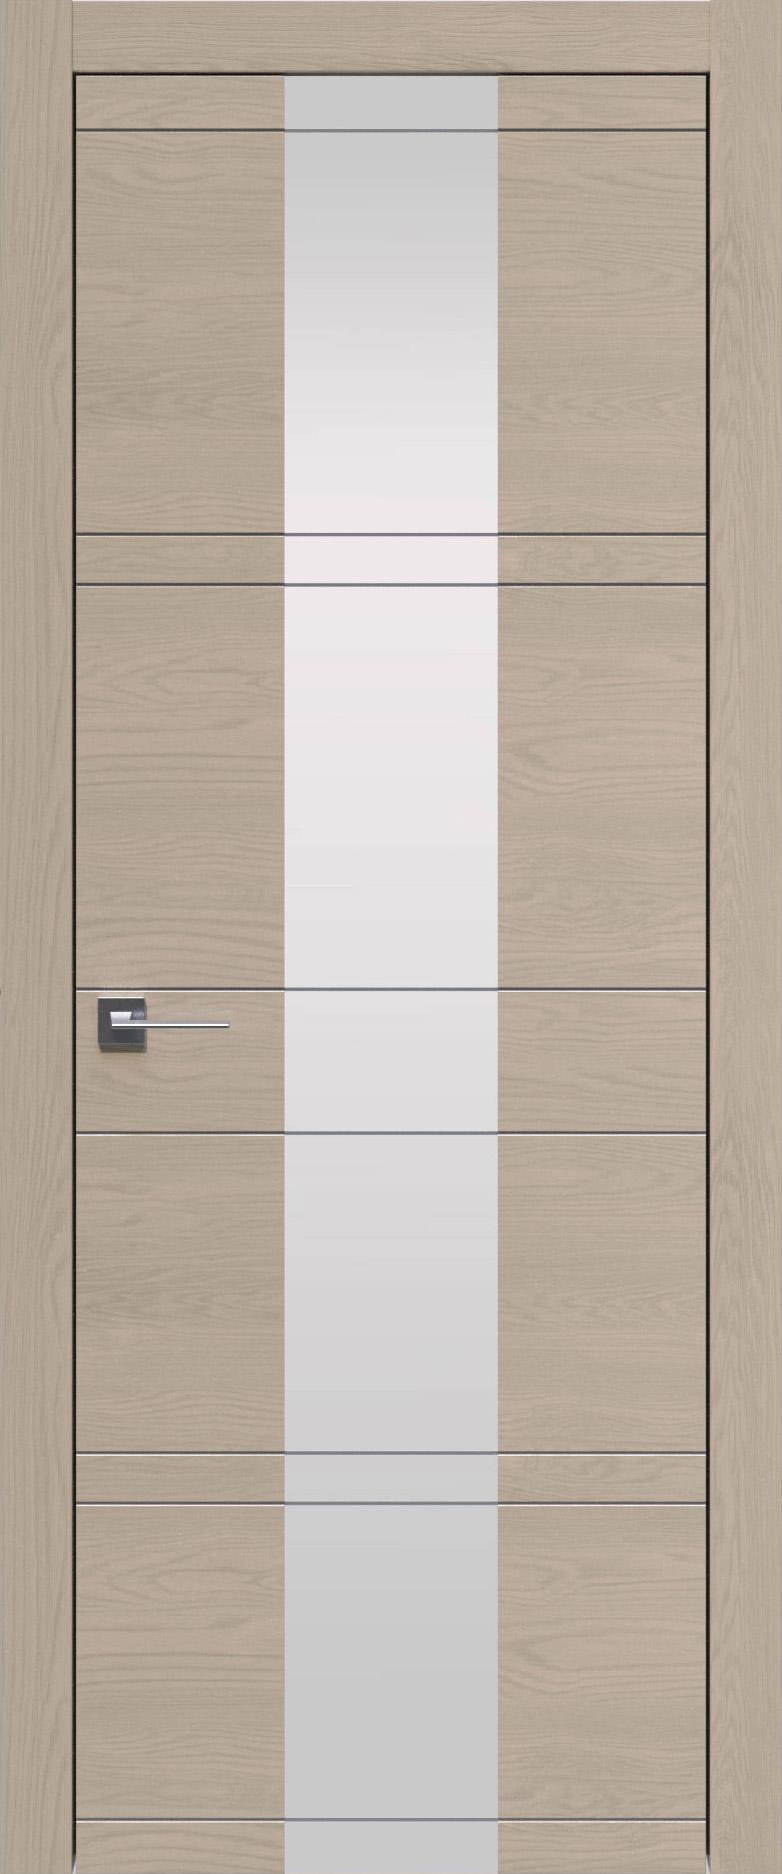 Tivoli Ж-2 цвет - Дуб муар Со стеклом (ДО)